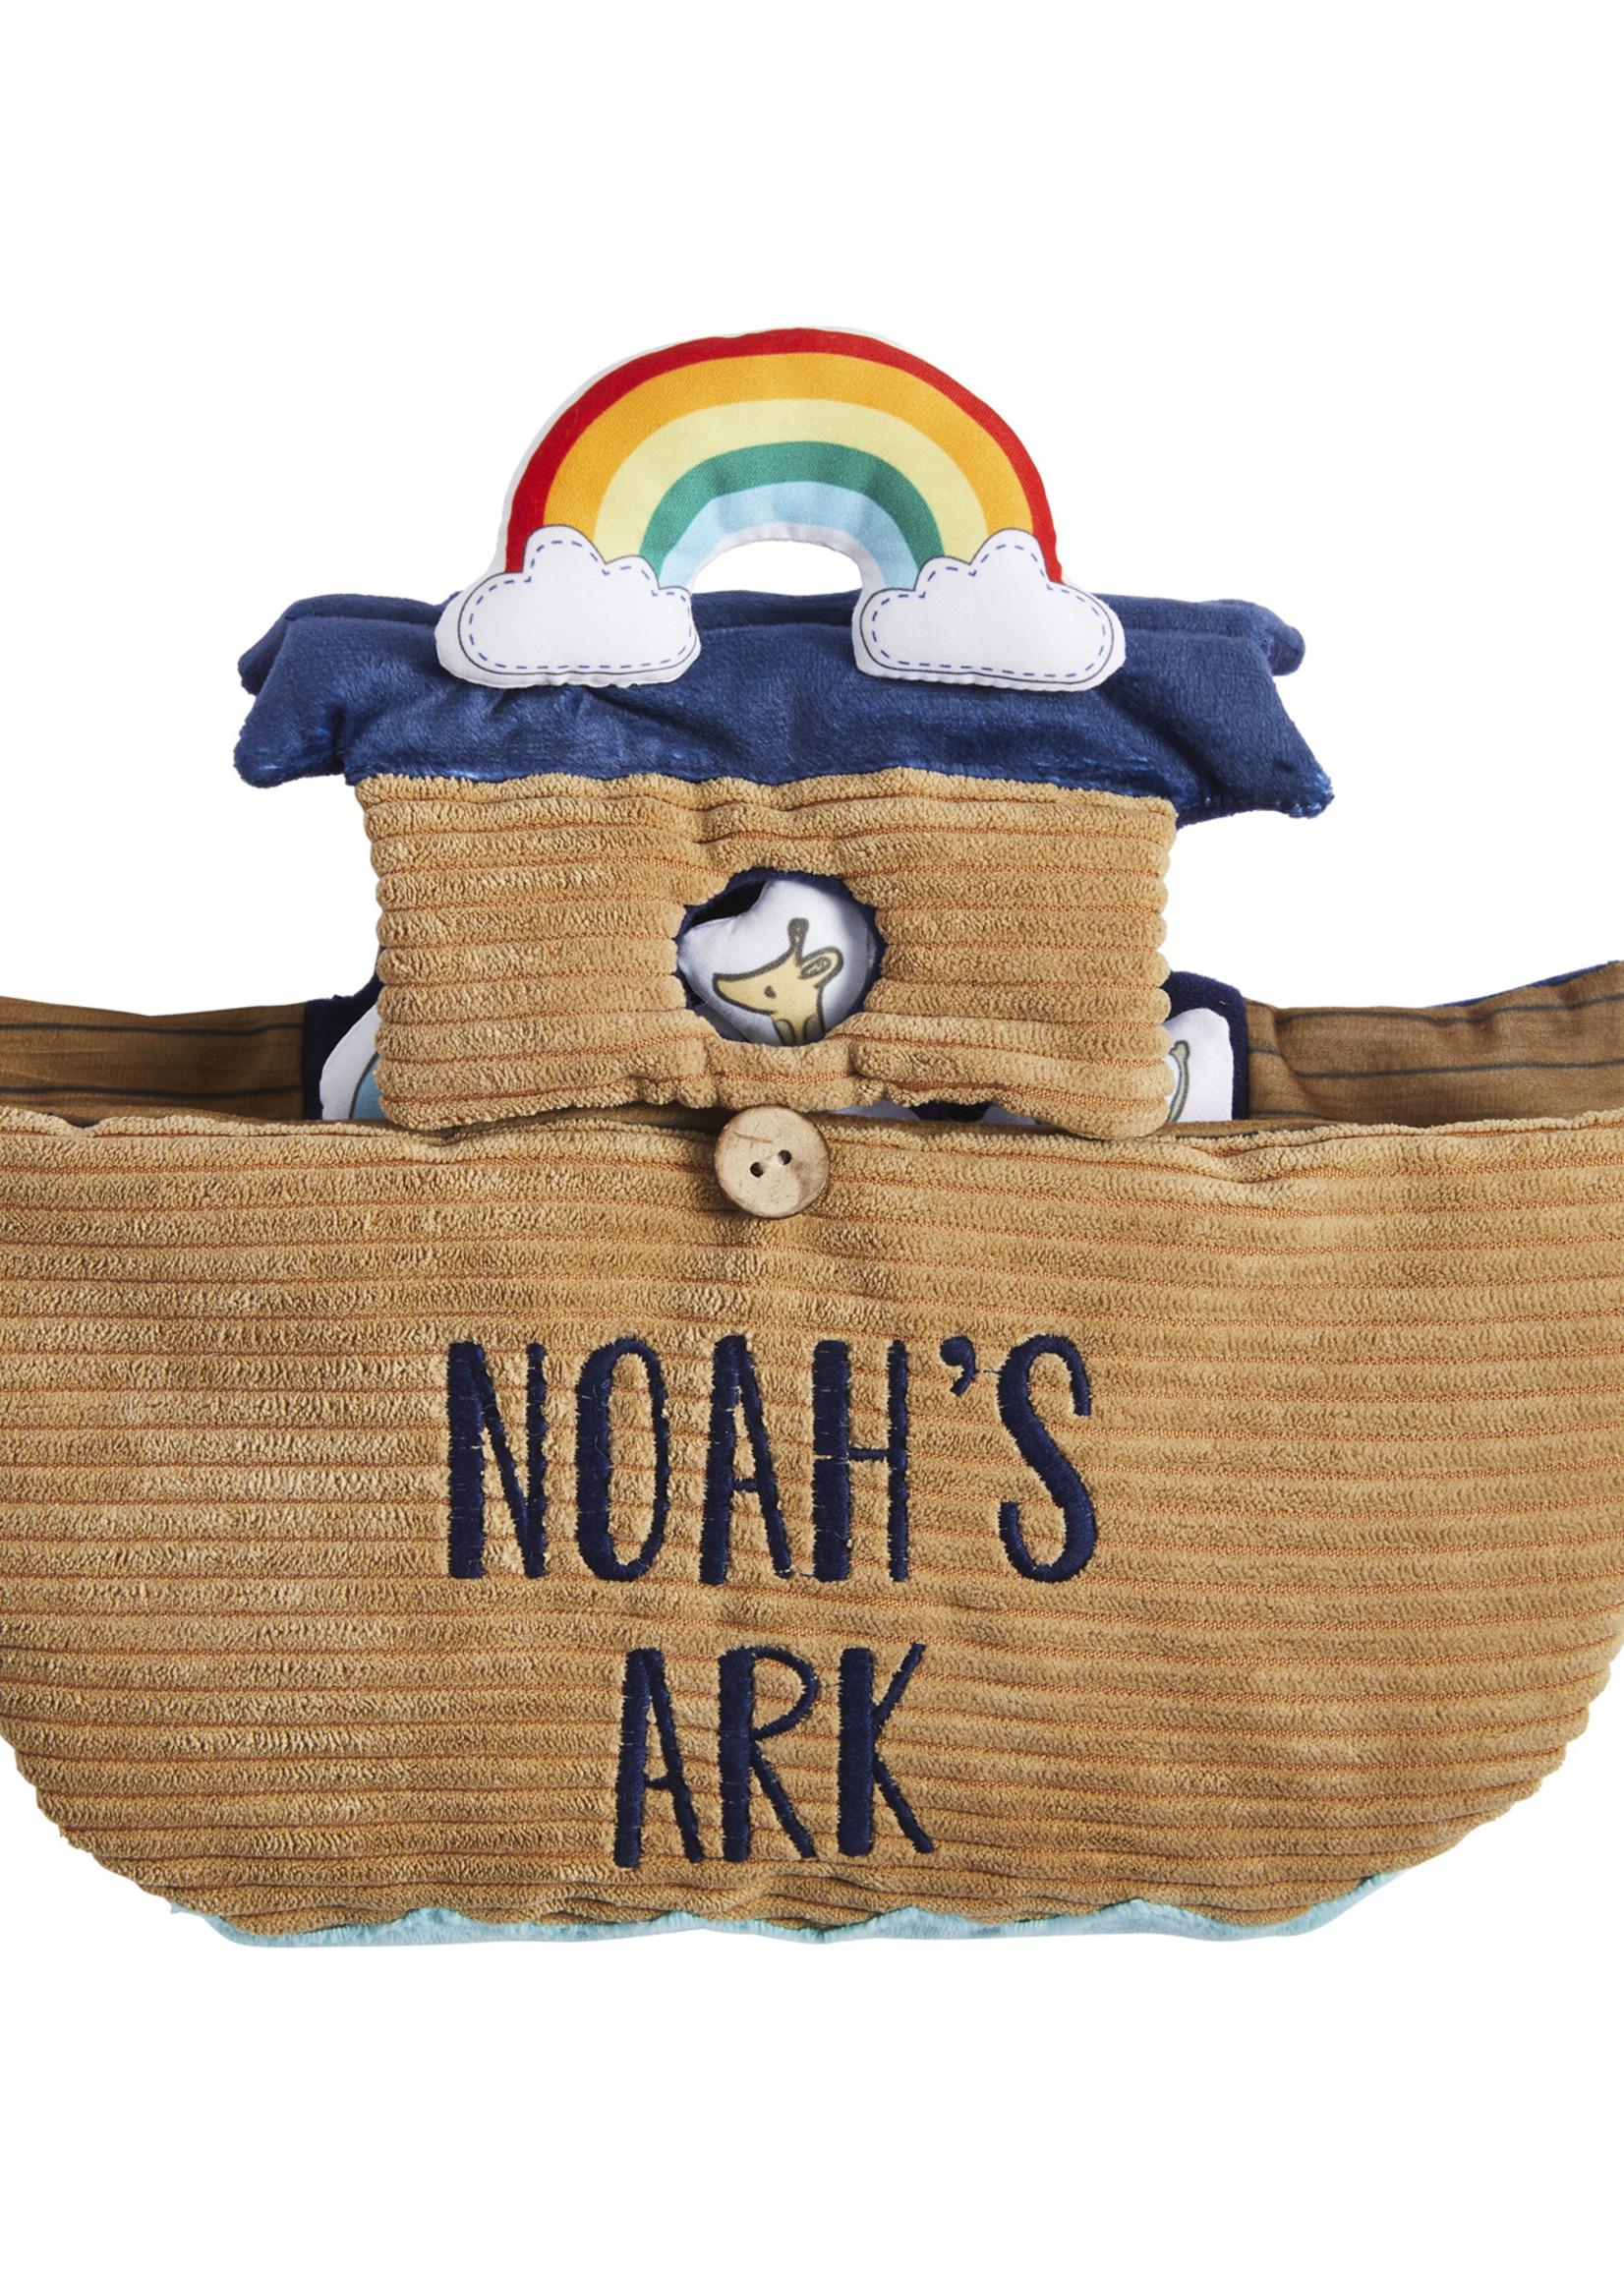 Mudpie NOAHS ARK BOOK